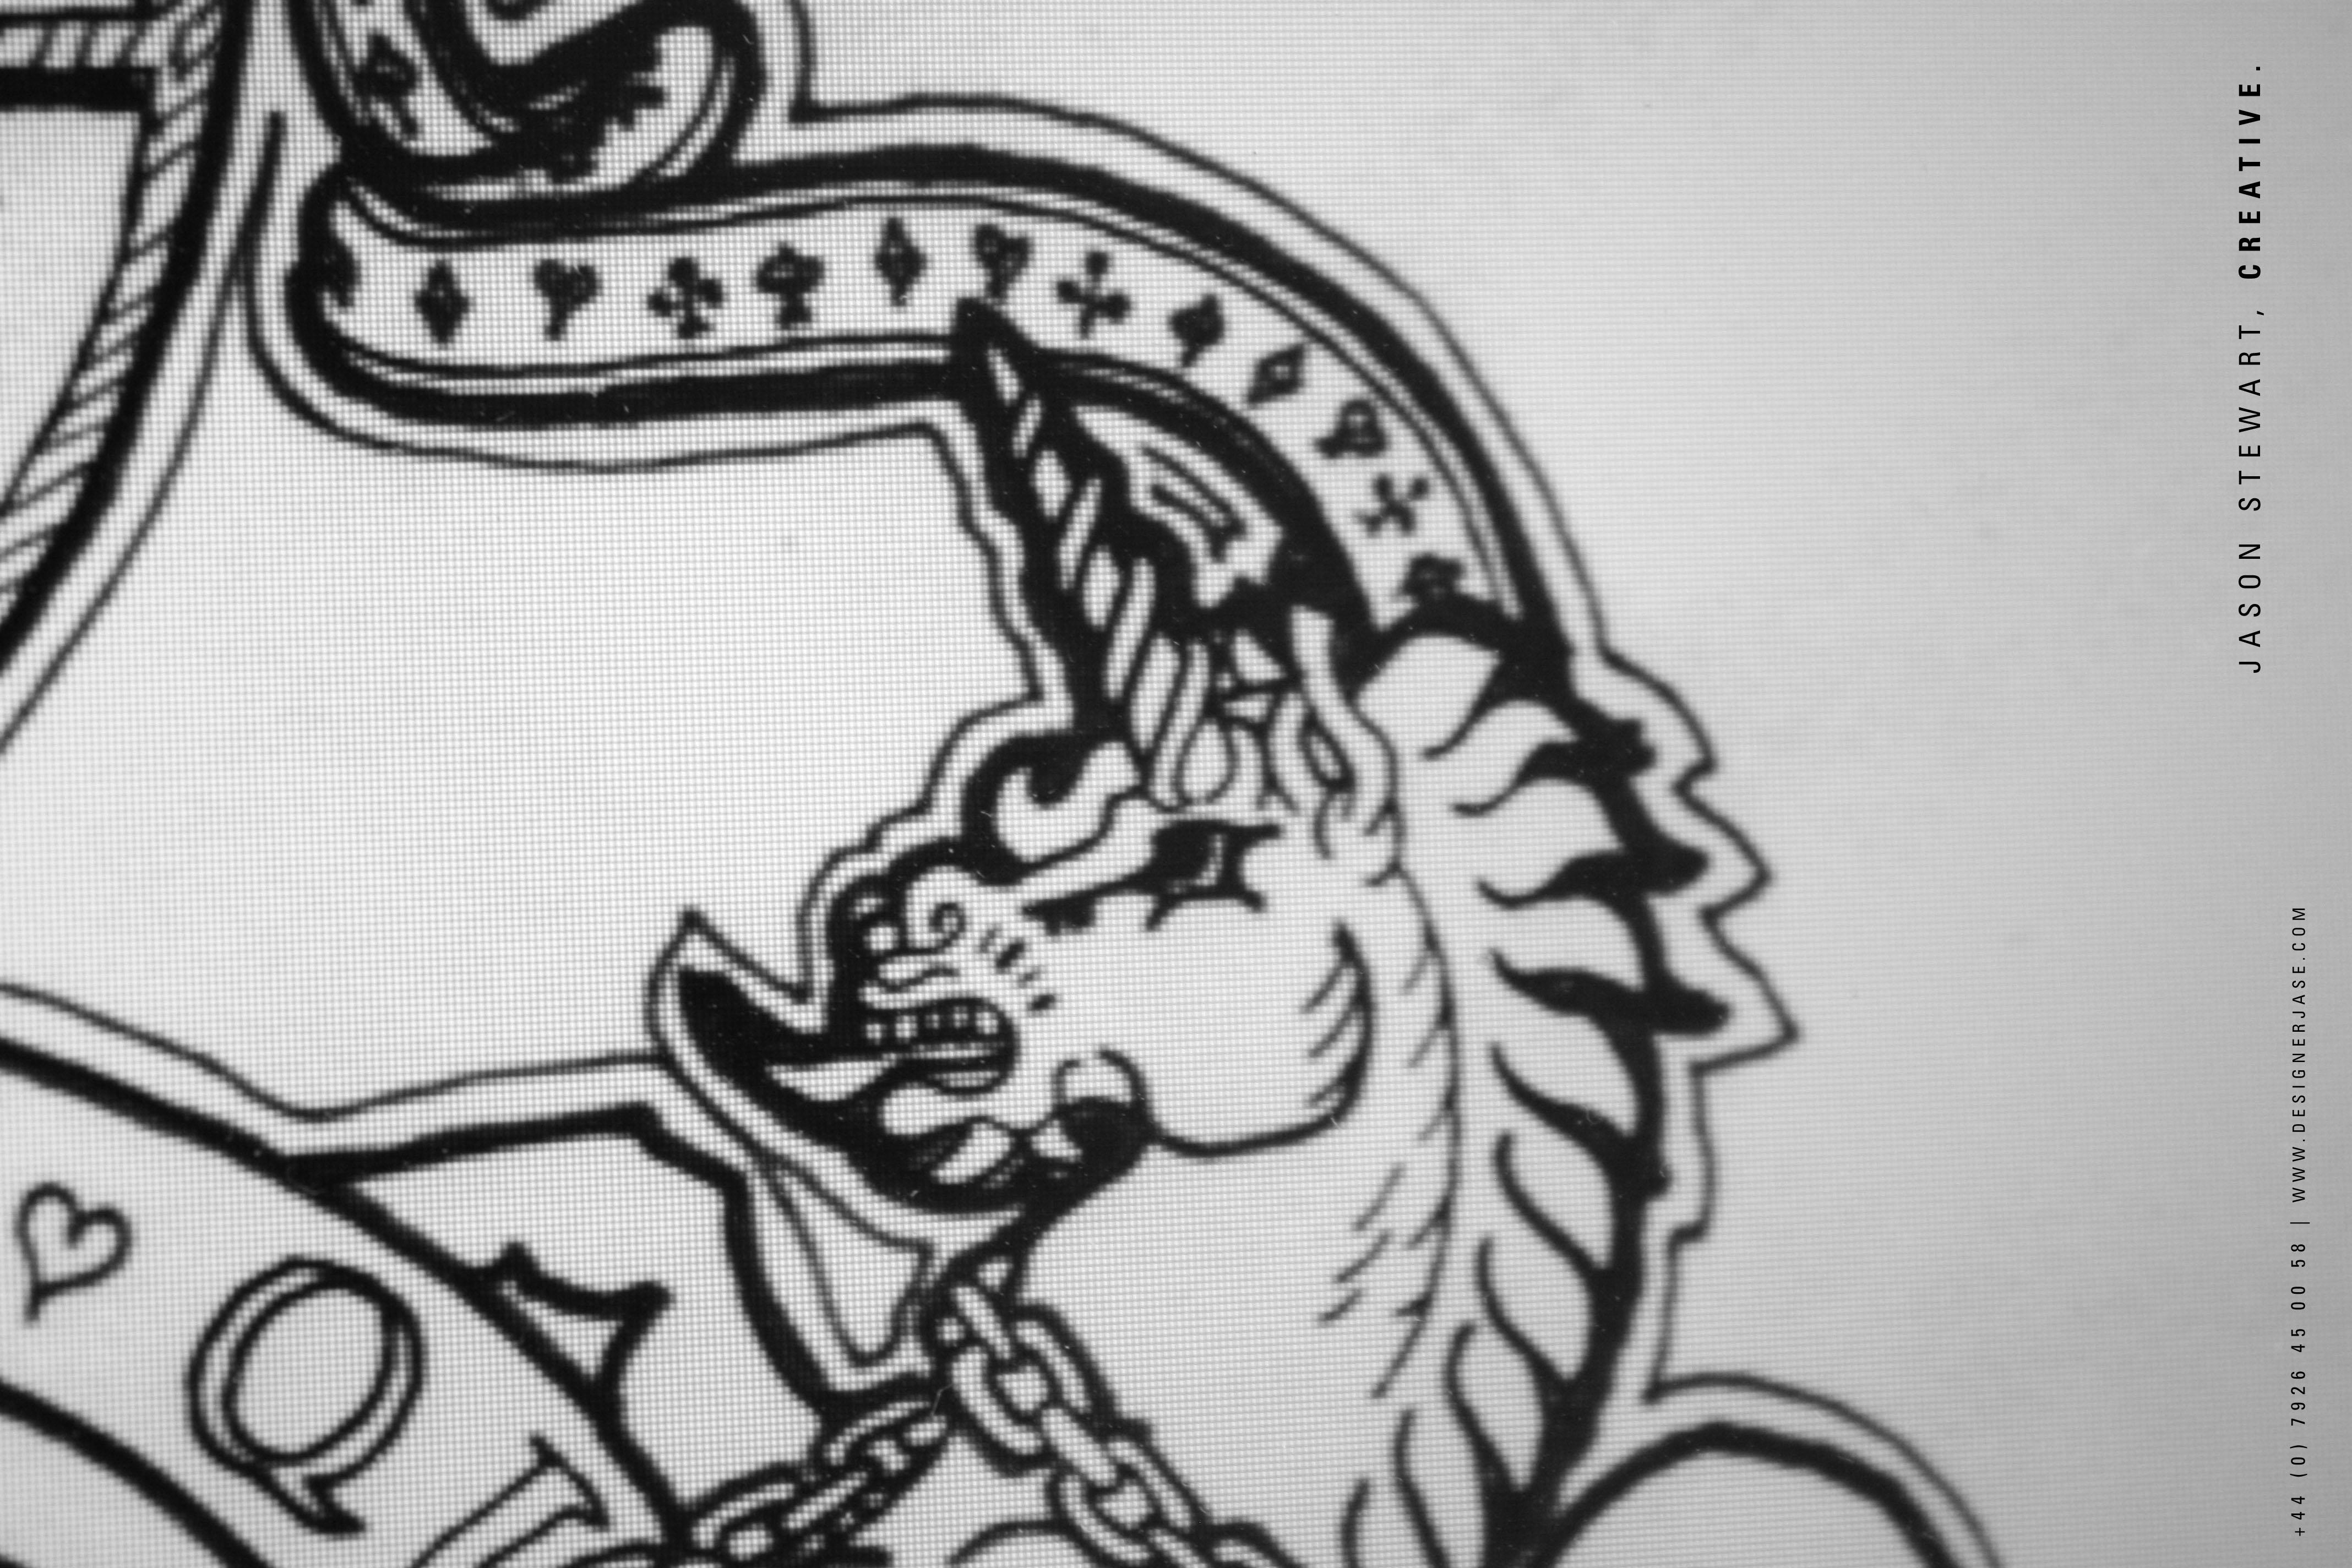 Drawn illuminati hand Of Detail Stewart Jason work